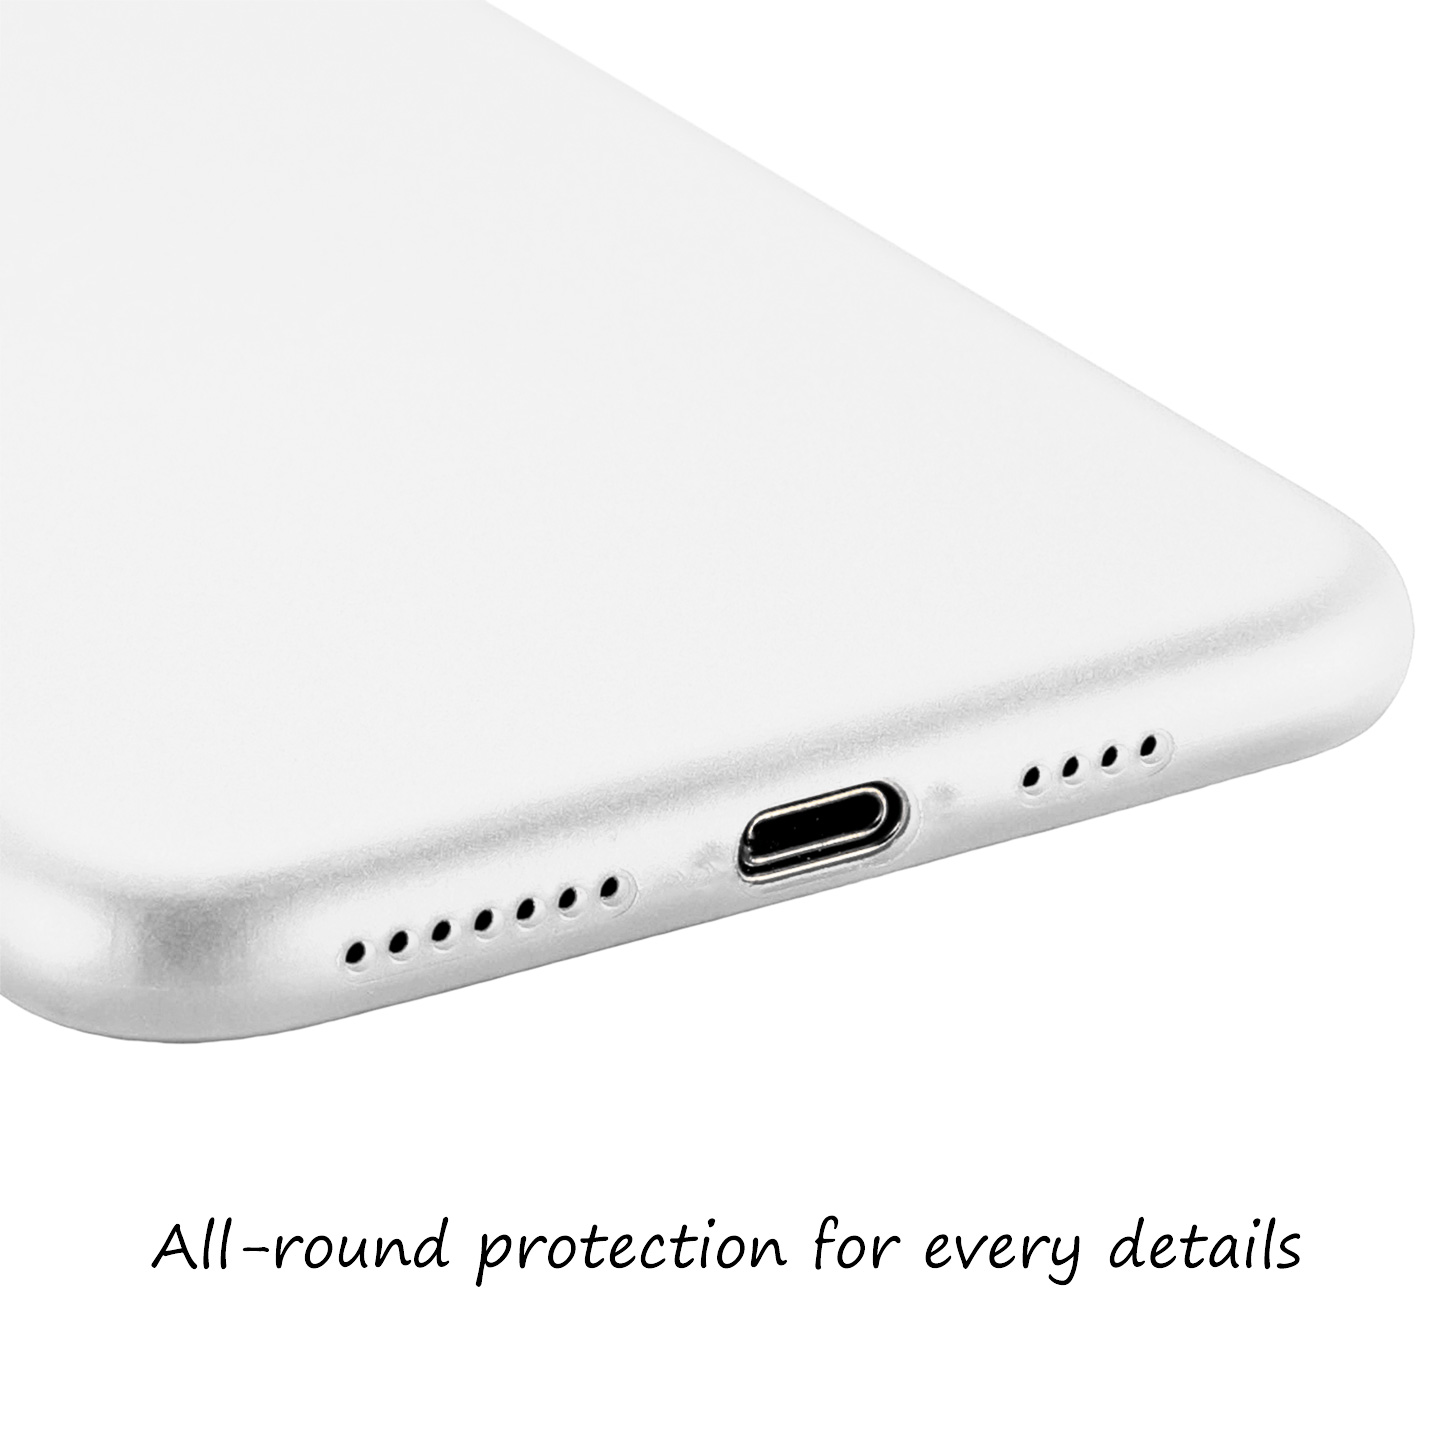 Ultra-Slim-Case-iPhone-11-Pro-5-8-034-Matt-Clear-Schutz-Huelle-Skin-Cover-Etui-Folie Indexbild 16